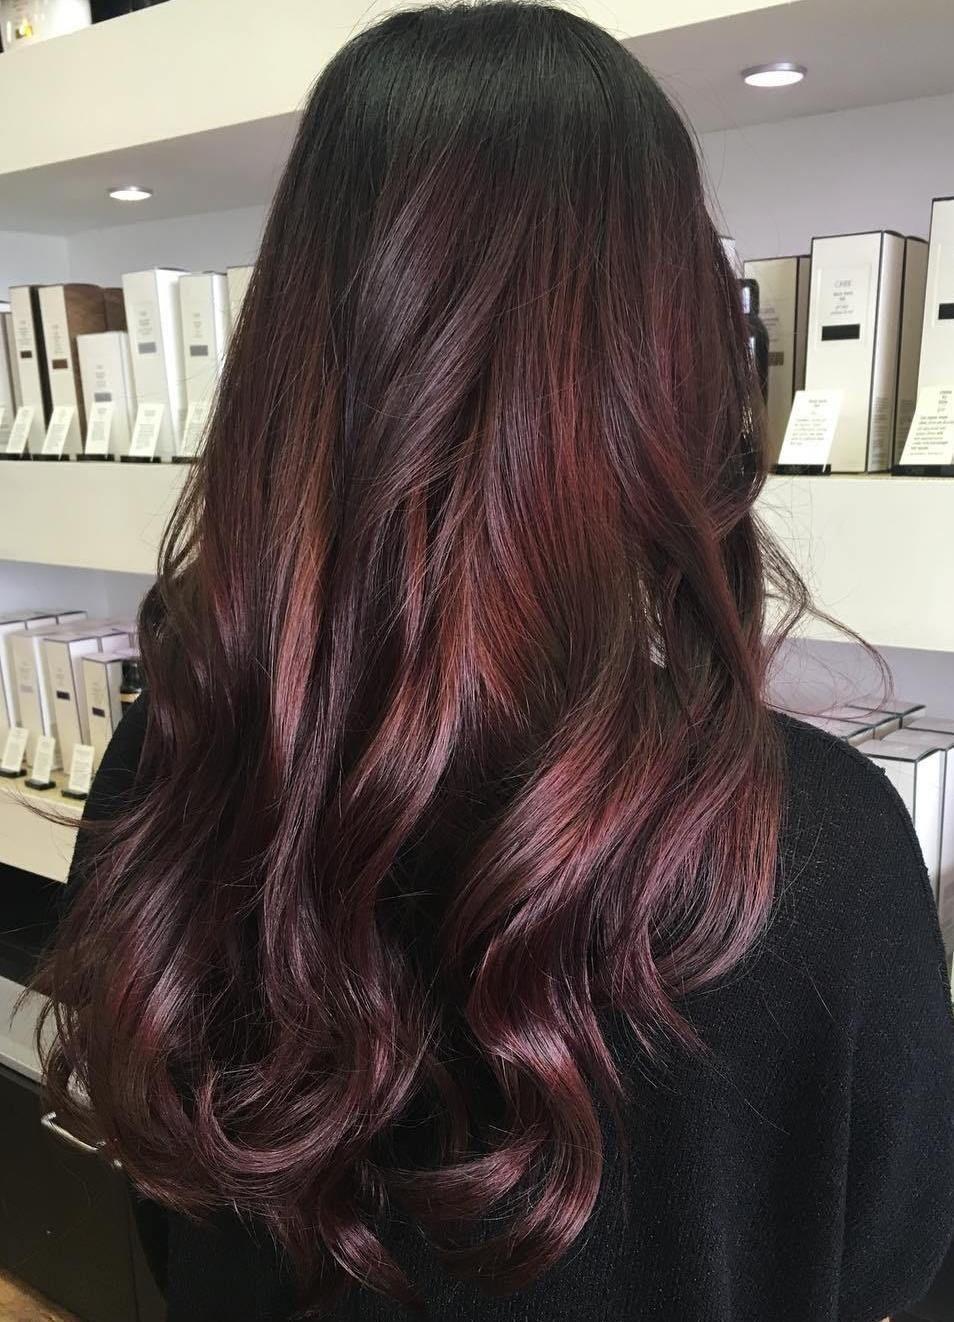 Dark Red Black Hair Dye Google Search Hair Color Burgundy Maroon Hair Colors Burgundy Hair